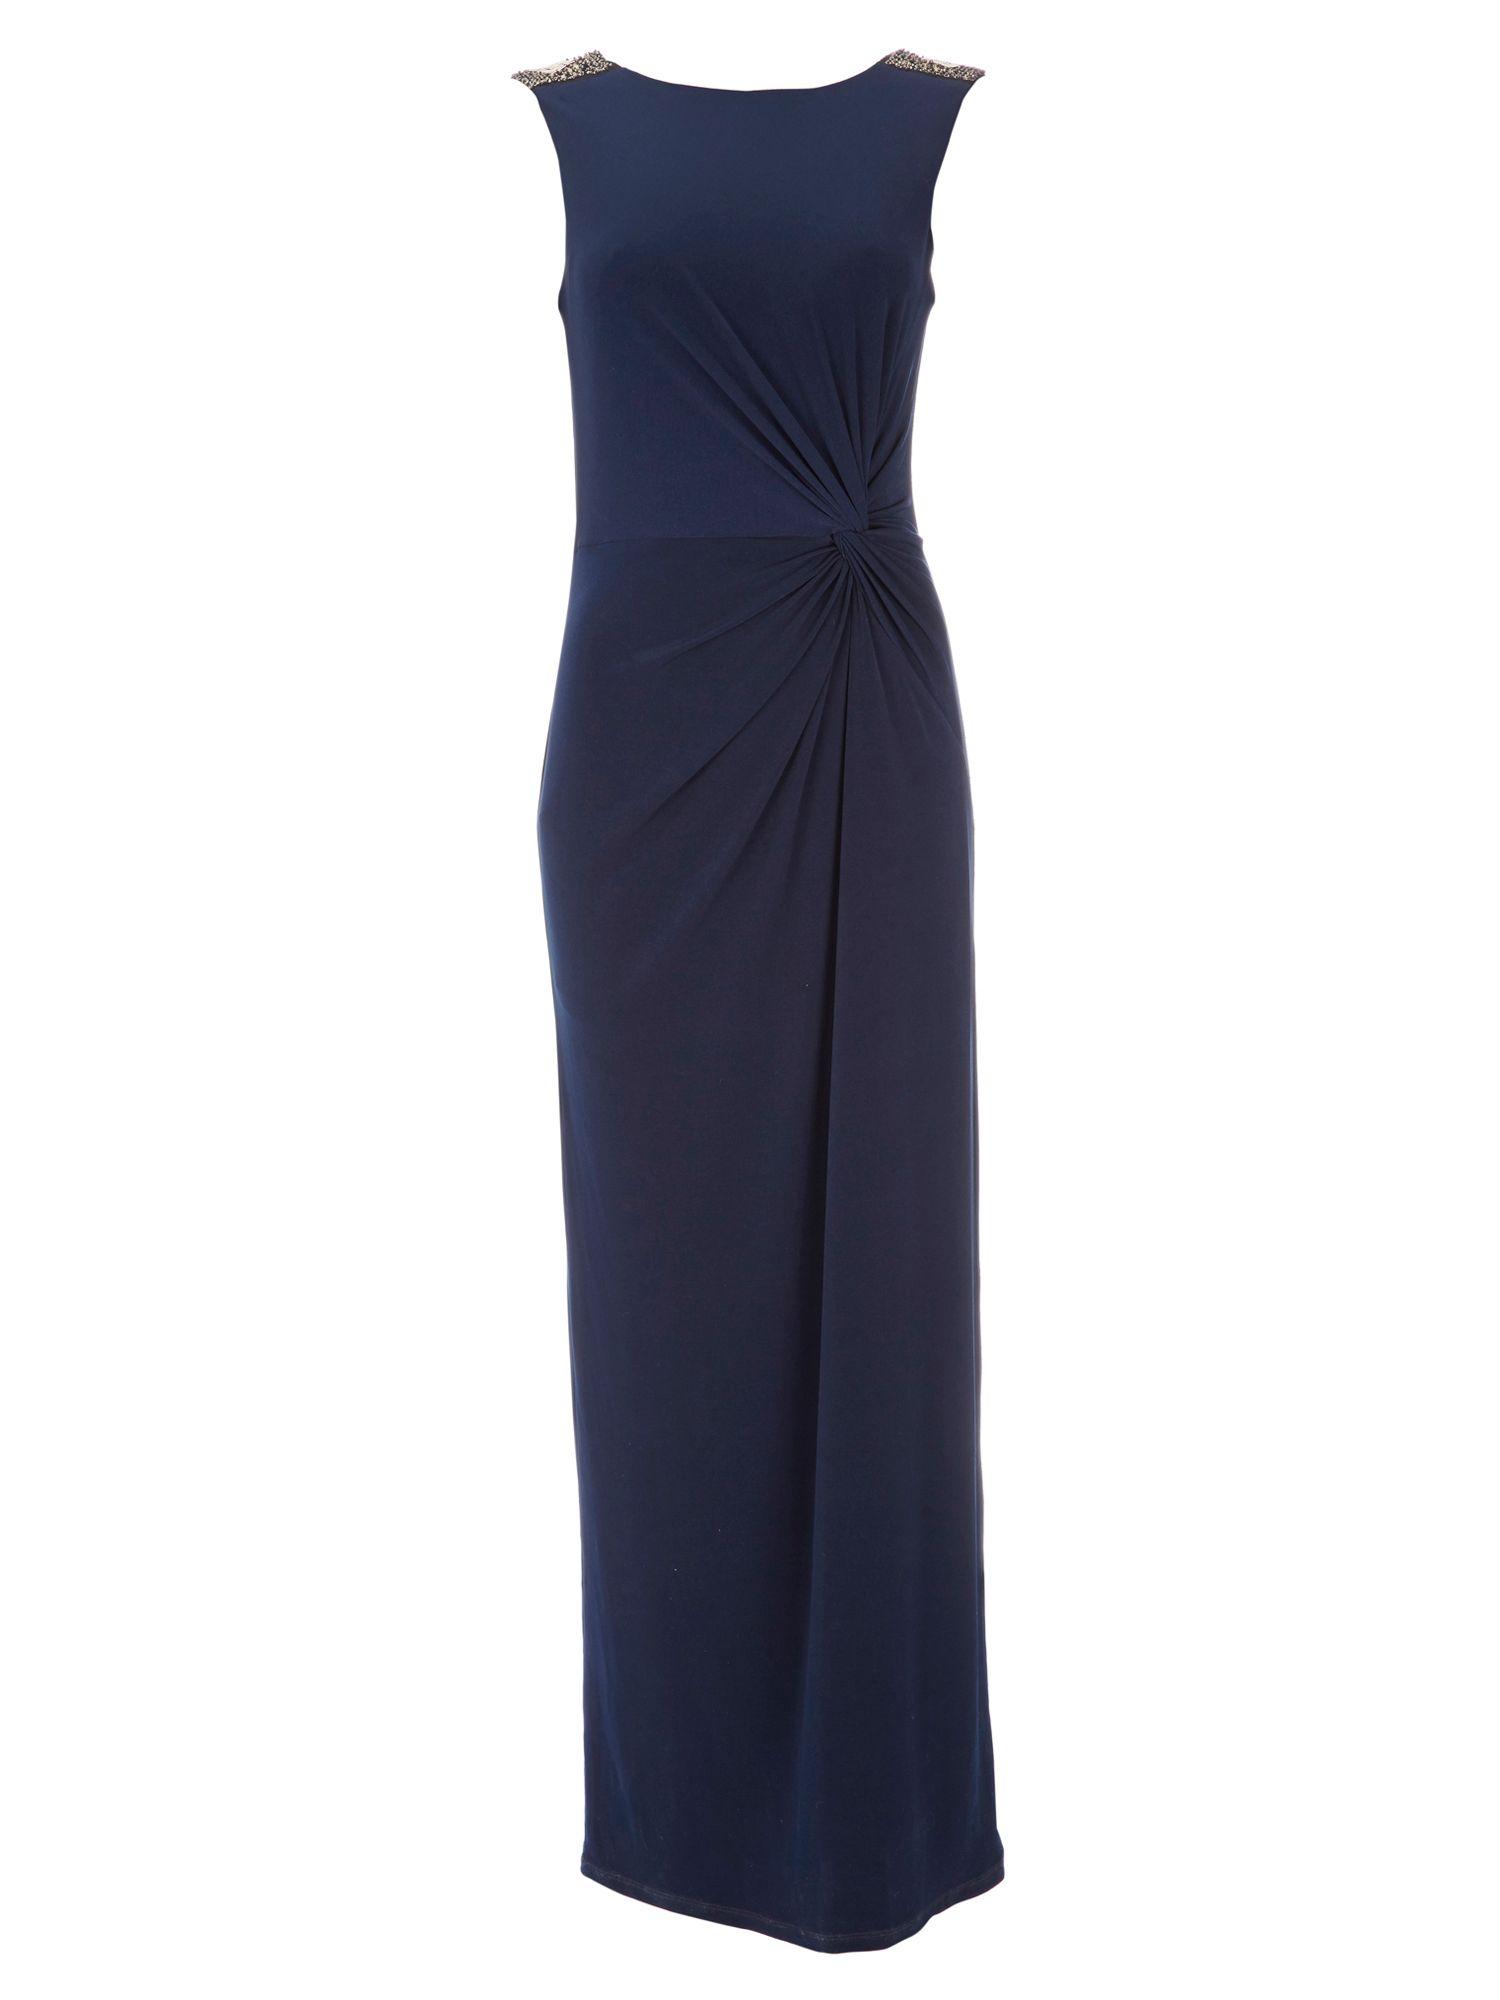 Wallis Navy Embellished Dress In Blue Navy Lyst